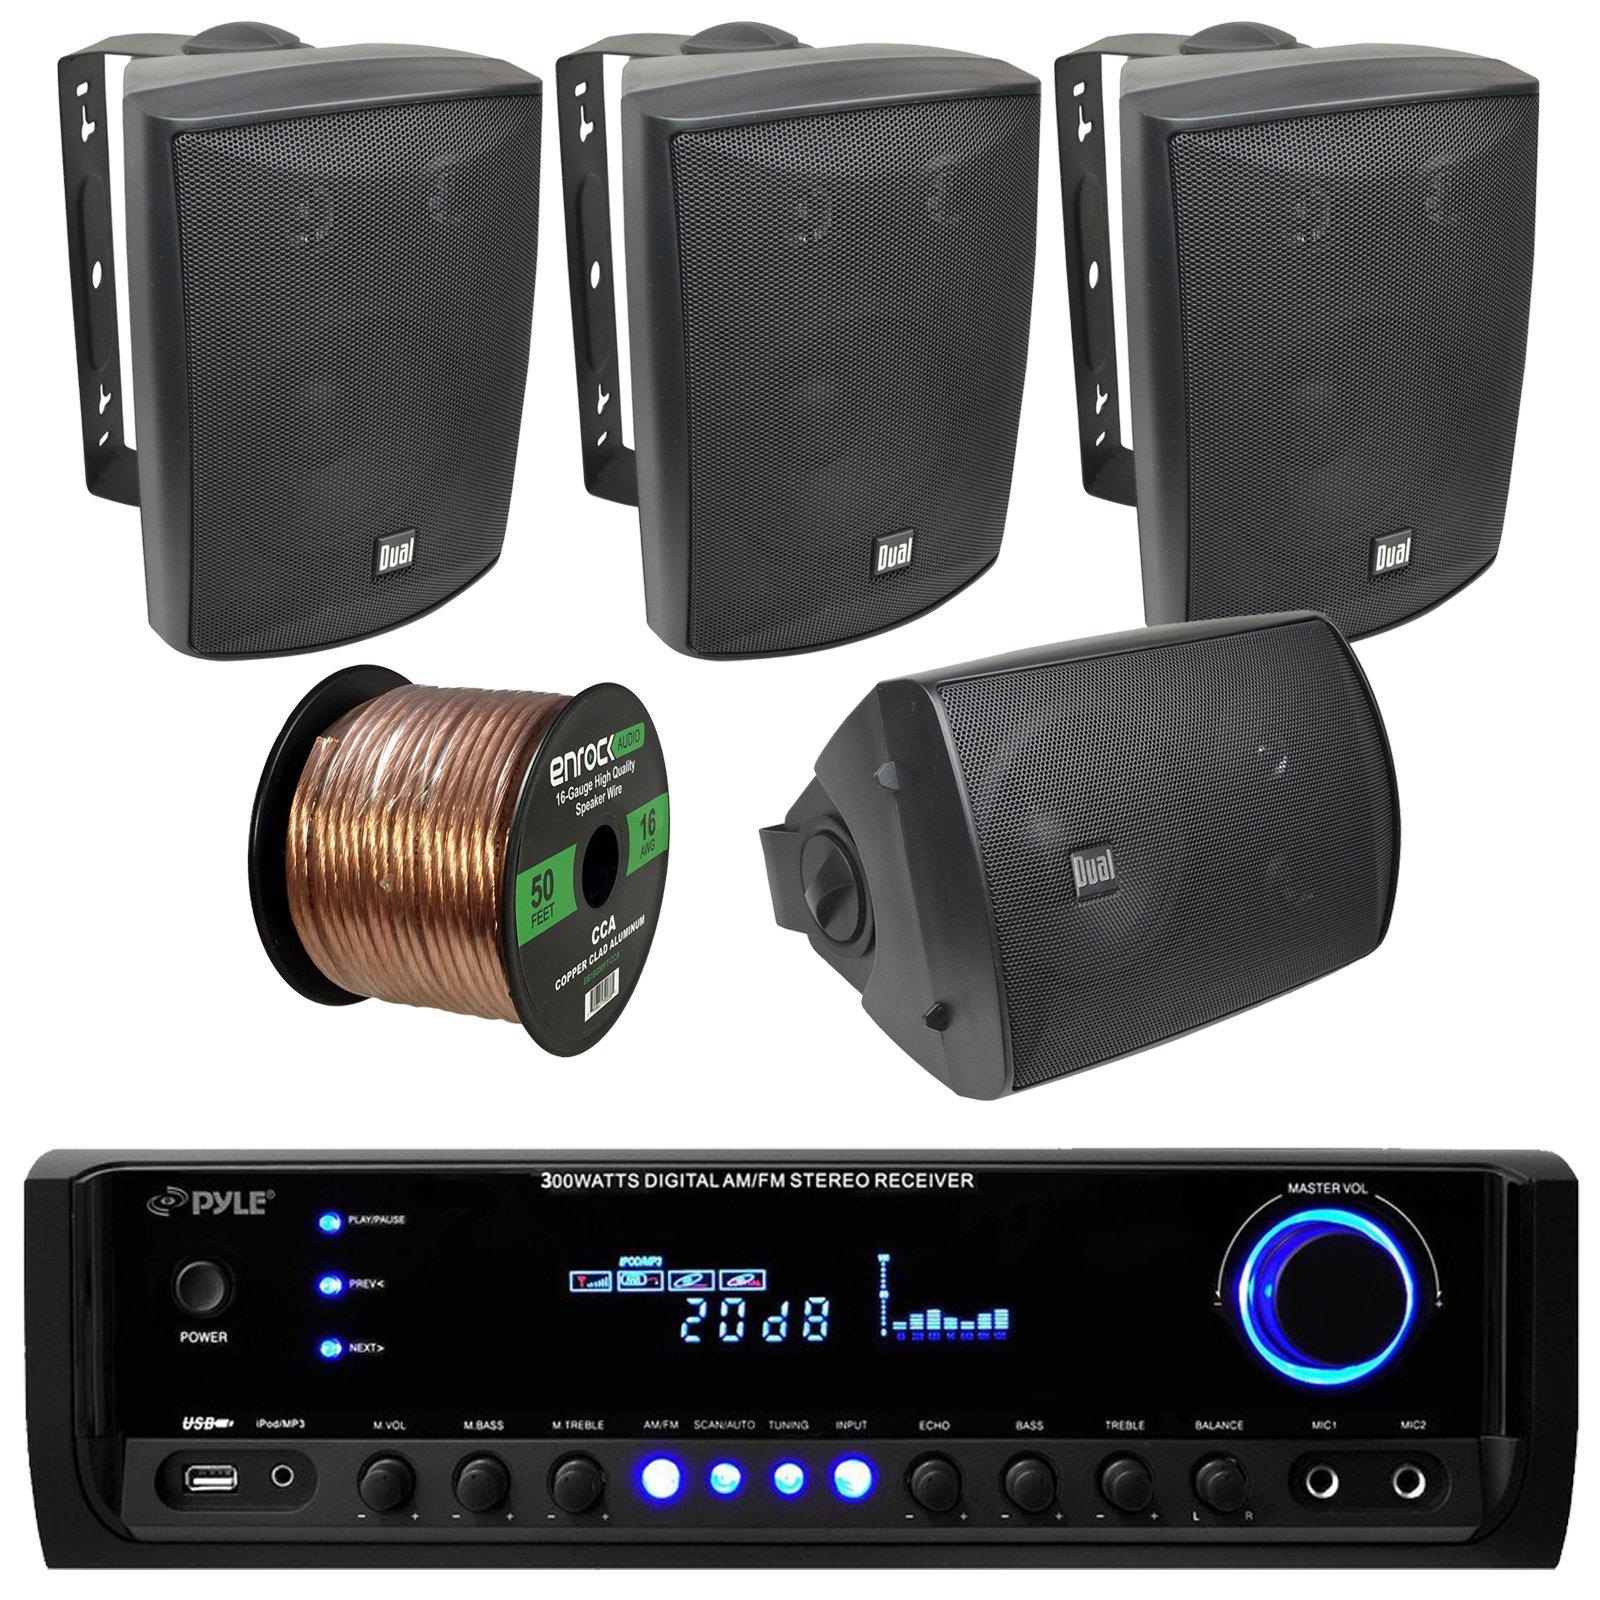 Pyle PT390BTU Bluetooth Digital Home Theater 300-Watt Stereo Receiver Bundle Combo With 4x Dual-Electronics LU53PB 125 Watt 3-way Black Indoor/Outdoor Speakers + Enrock 50ft 16g Speaker Wire by EnrockAudioBundle